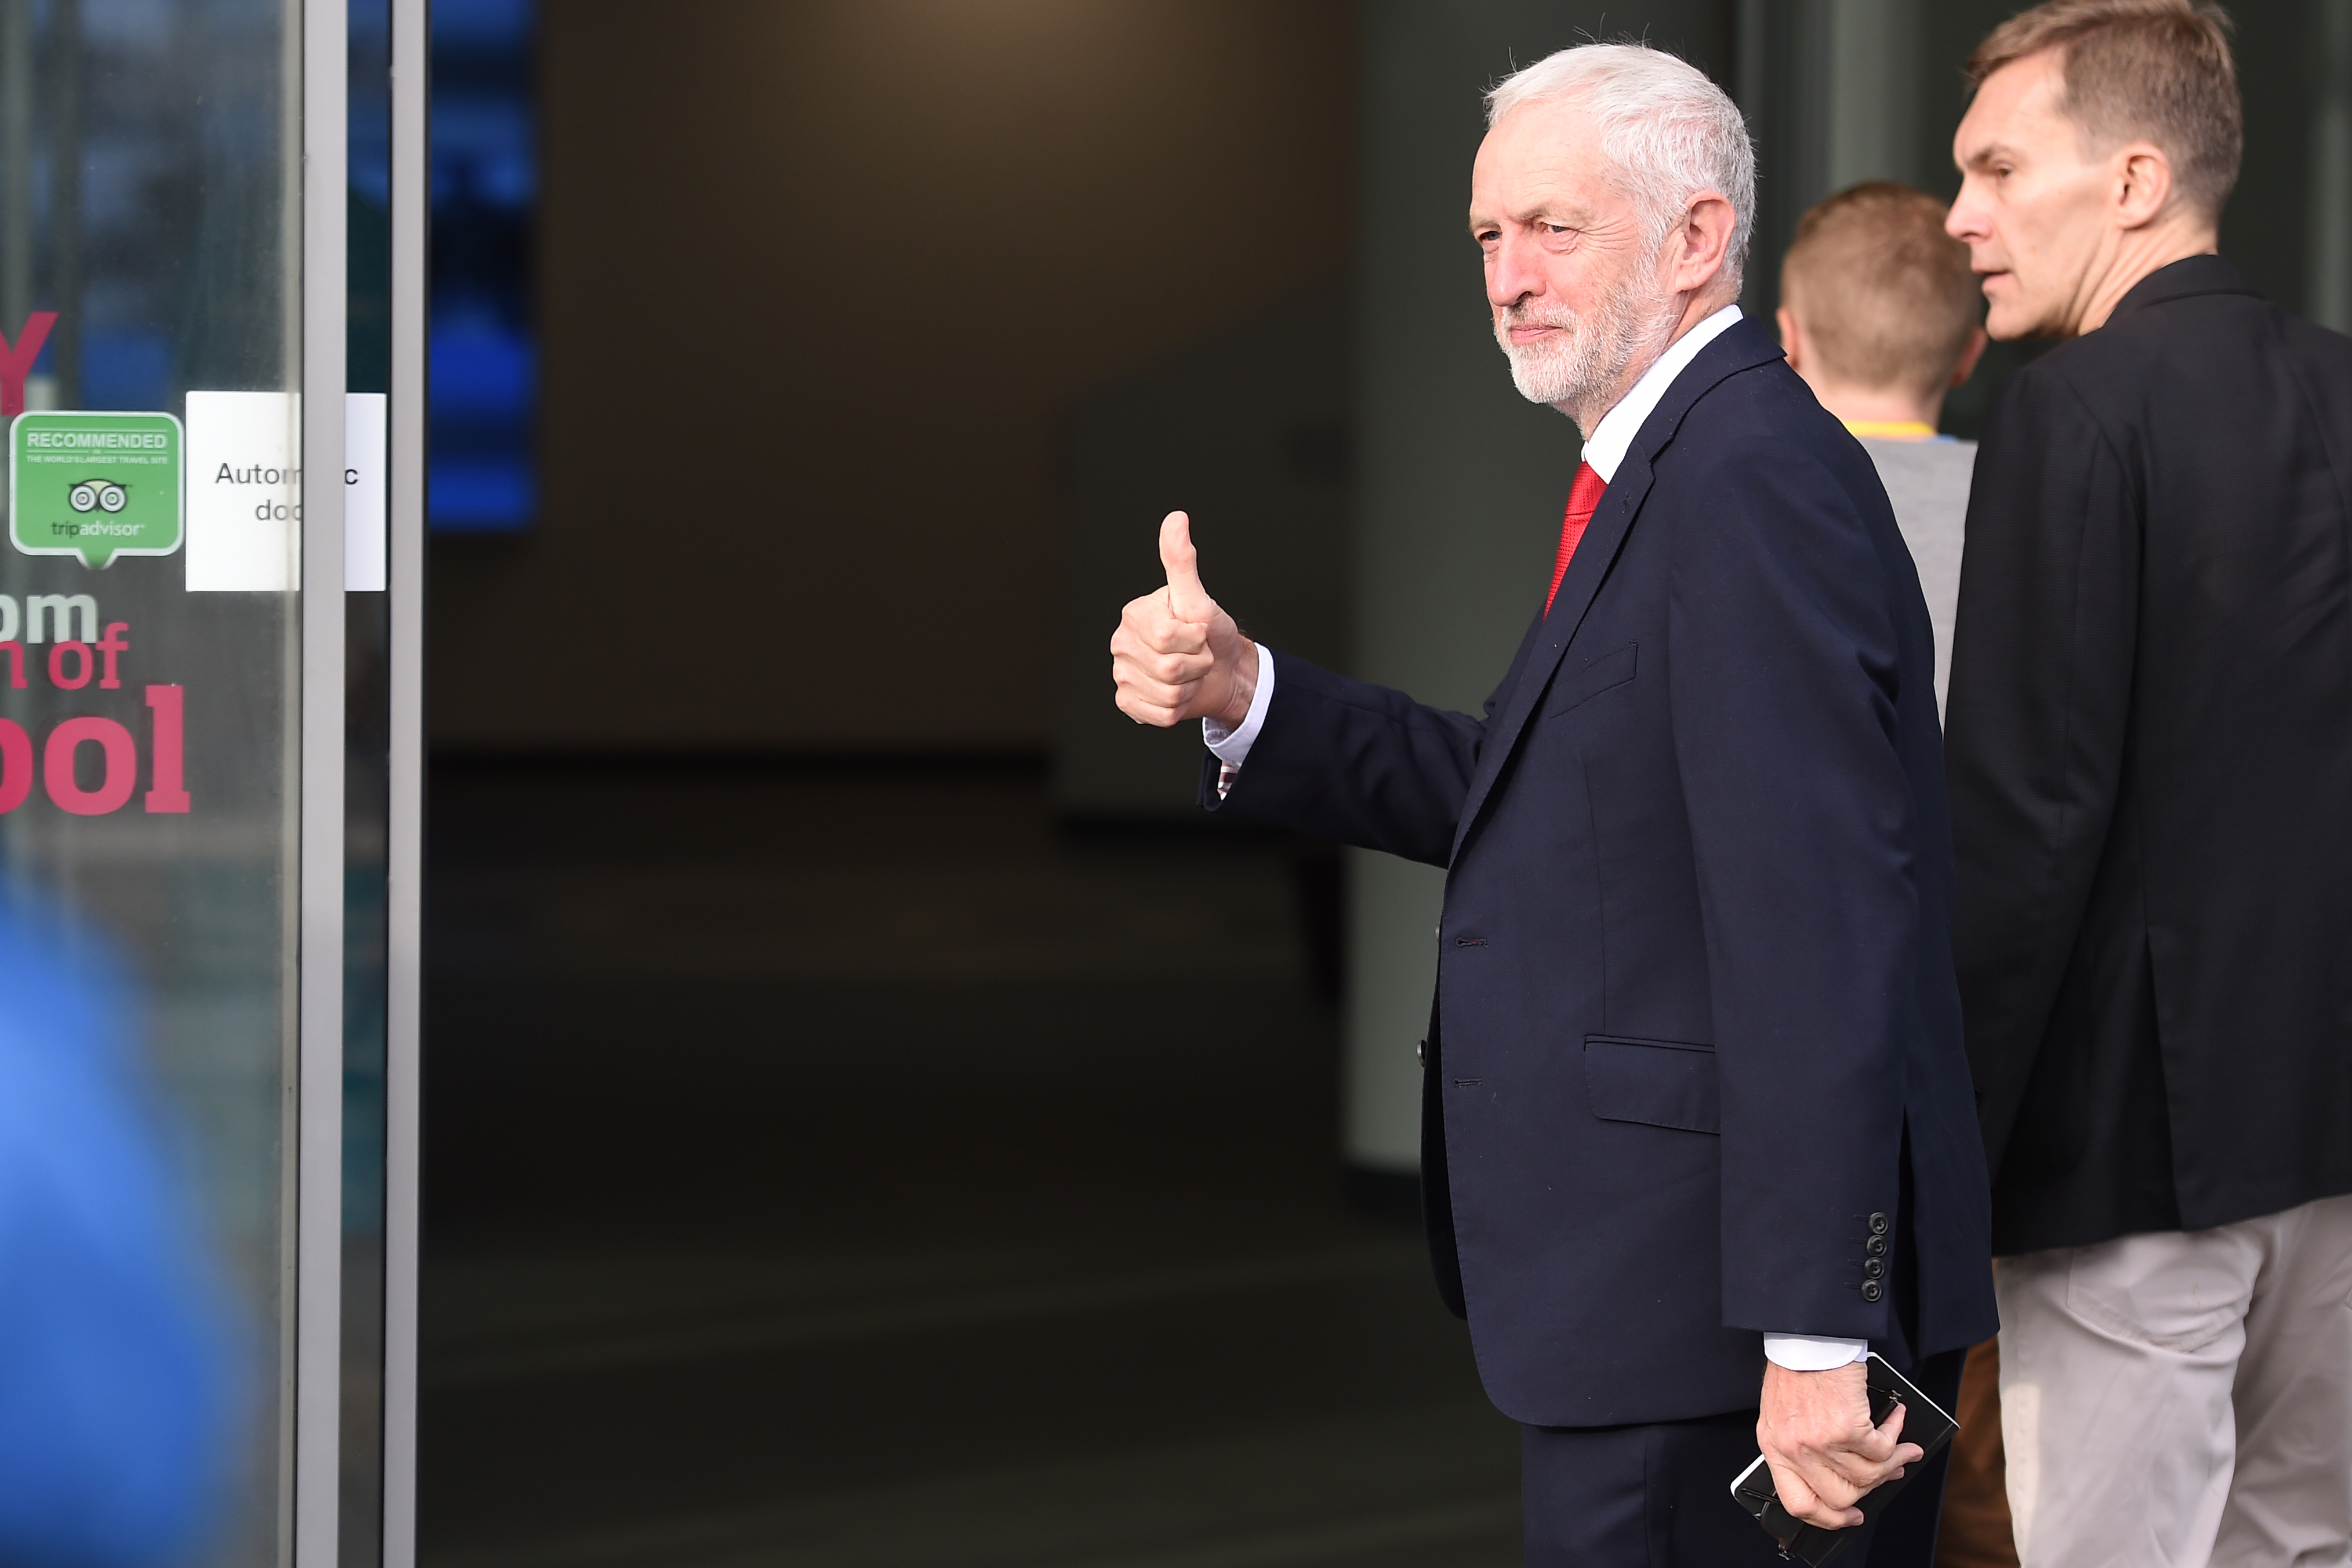 Jeremy Corbyn nem akarja megbuktatni Theresa Mayt